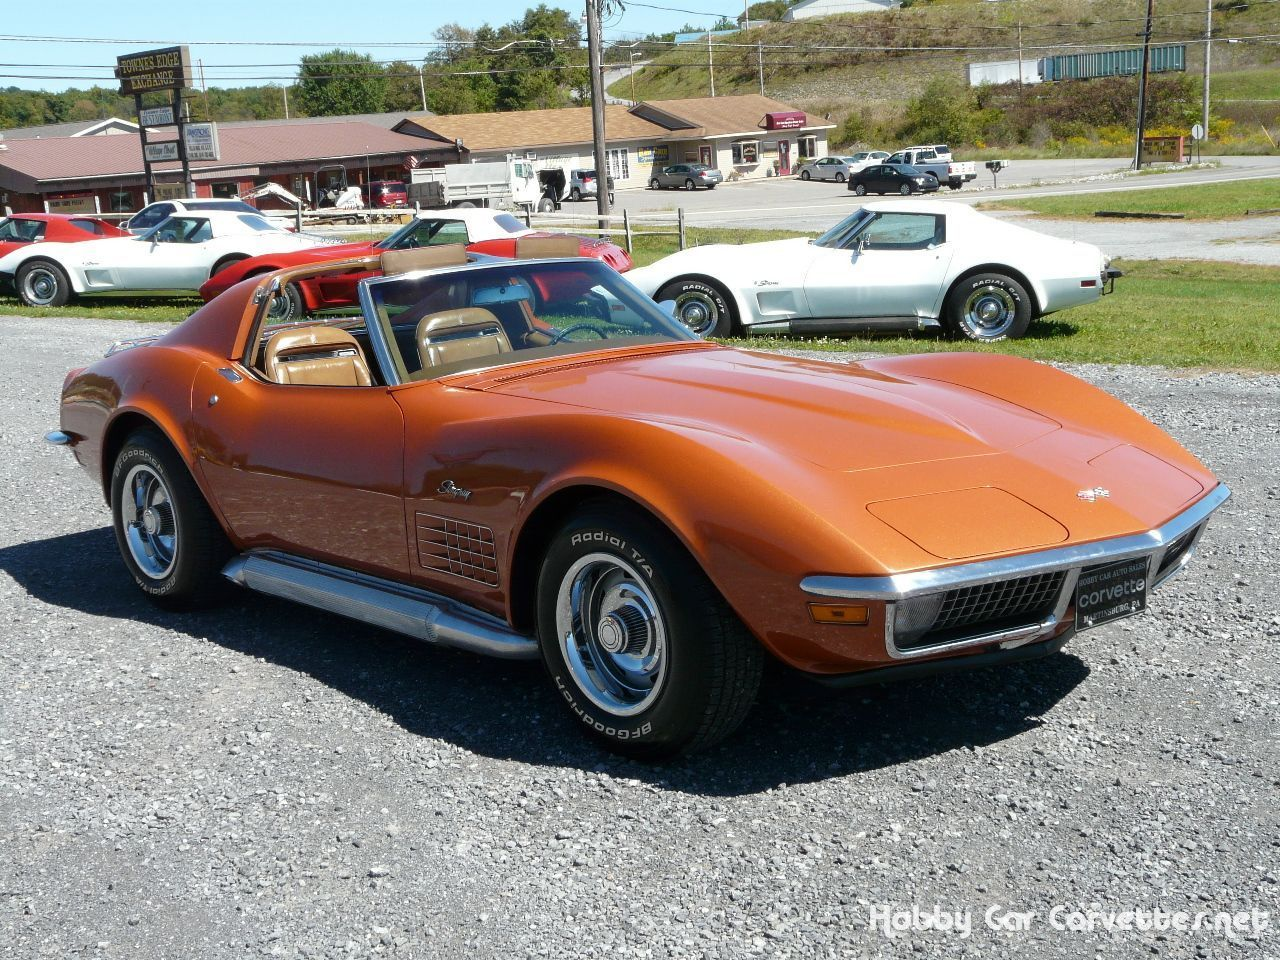 1971 Sting Ray Corvette 1971 Ontario Orange Corvette Stingray Dark Saddle Int 4spd Chevroletcorvettec Corvette